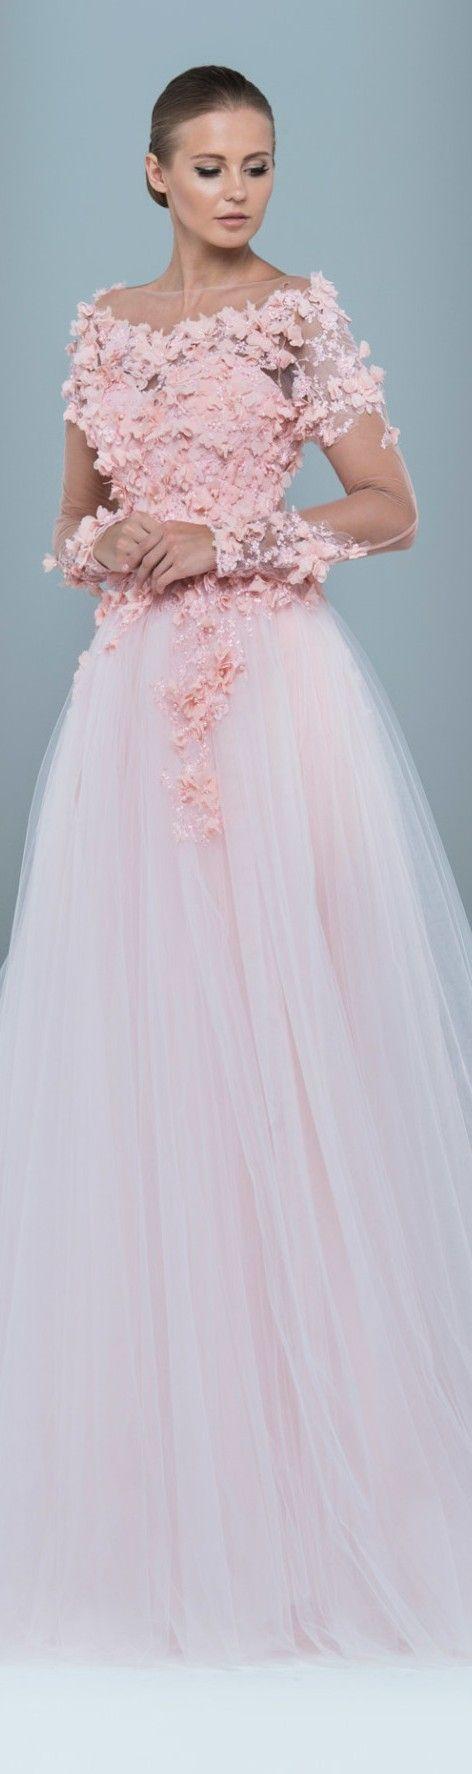 1129 best 2015 Wedding Dresses & Trends images on Pinterest ...